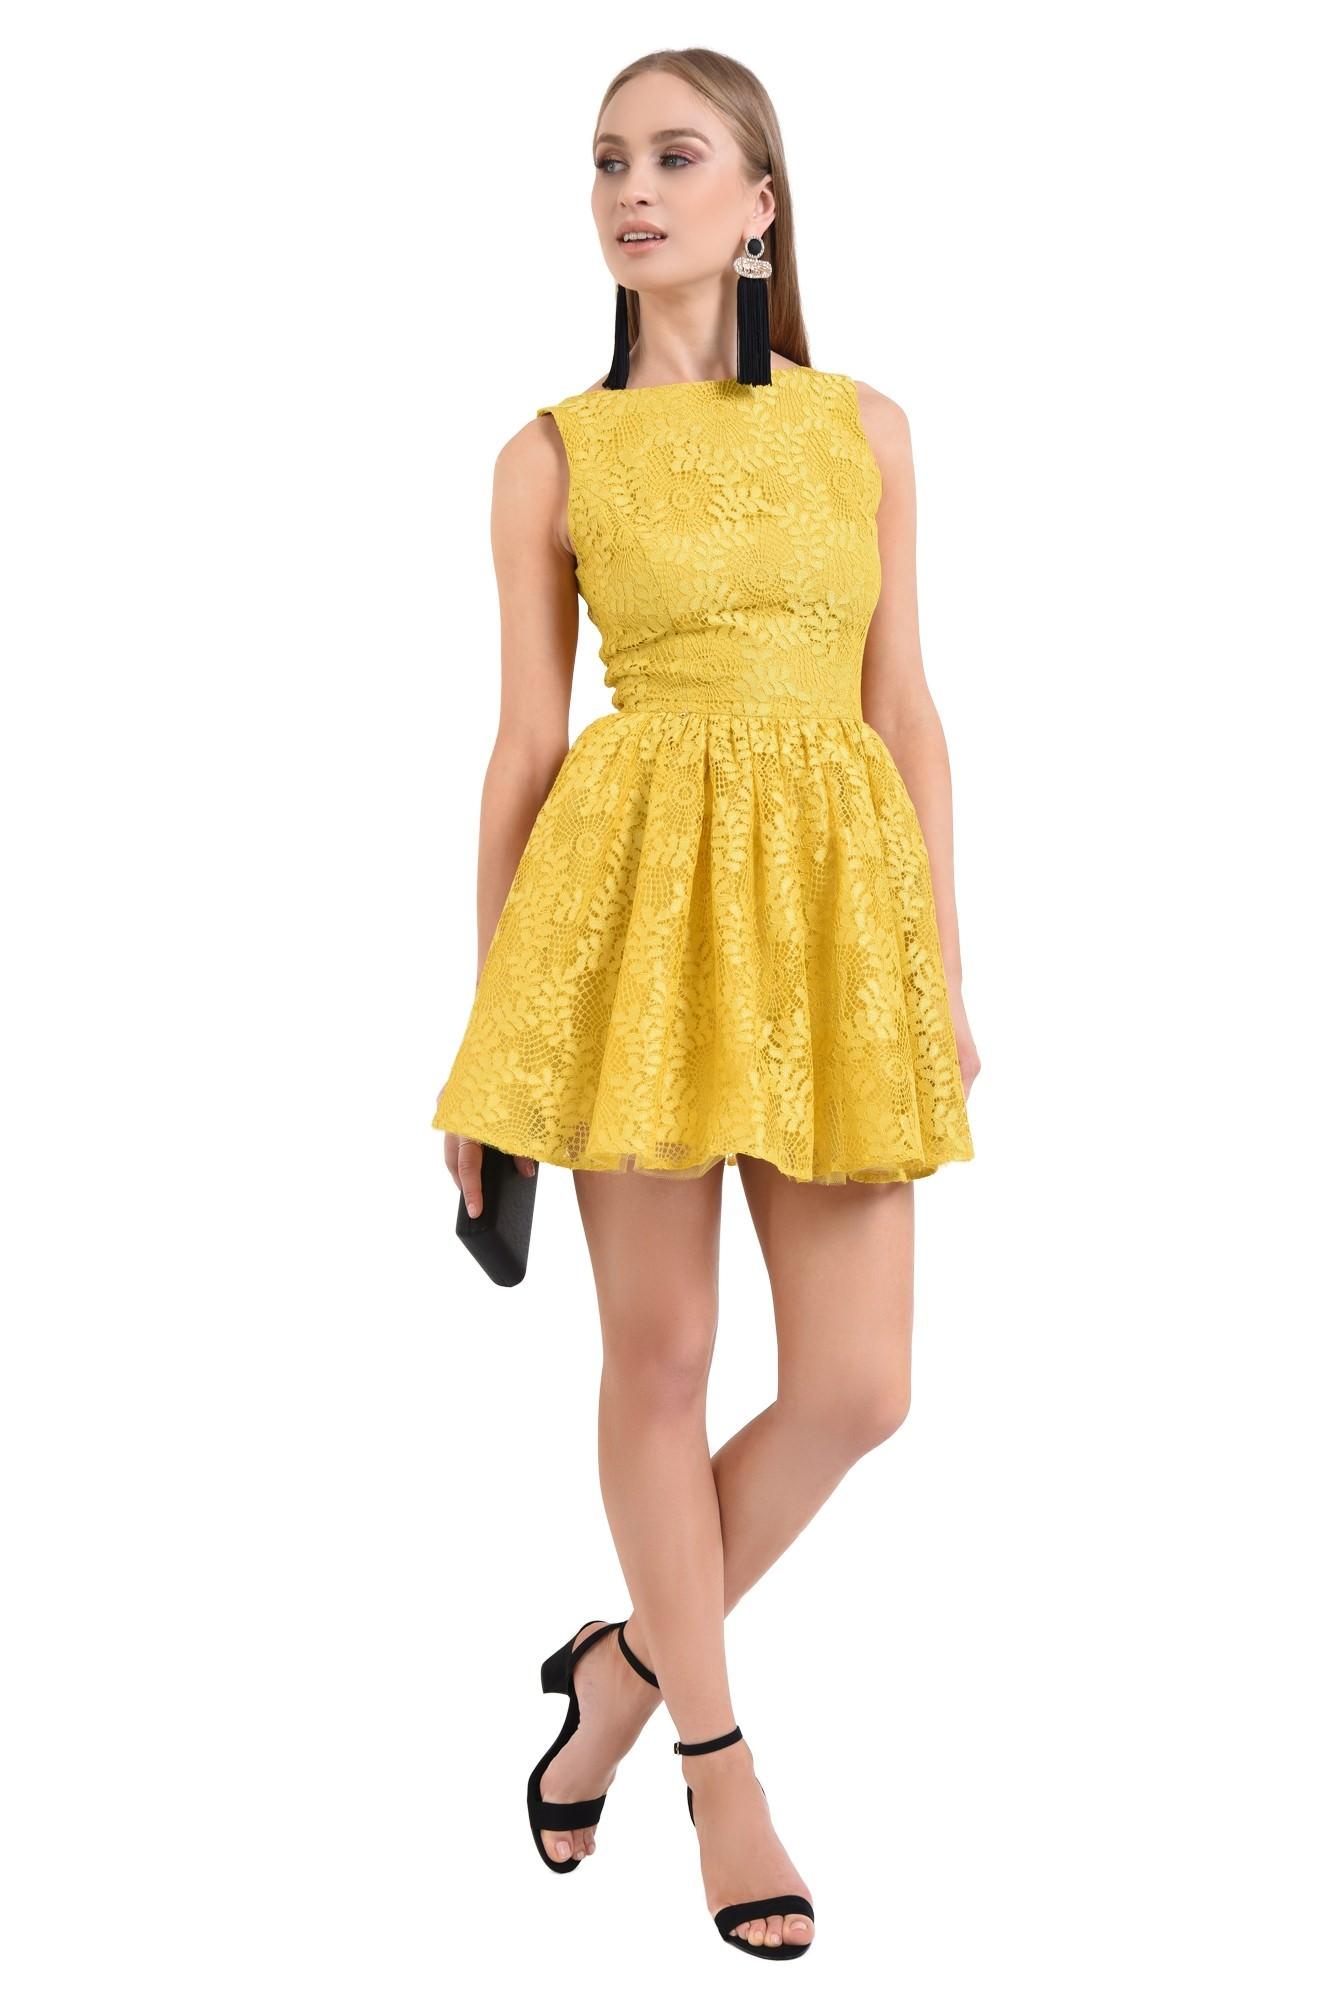 3 - 360 - rochie de seara, dantela galbena, cloche, rochii online